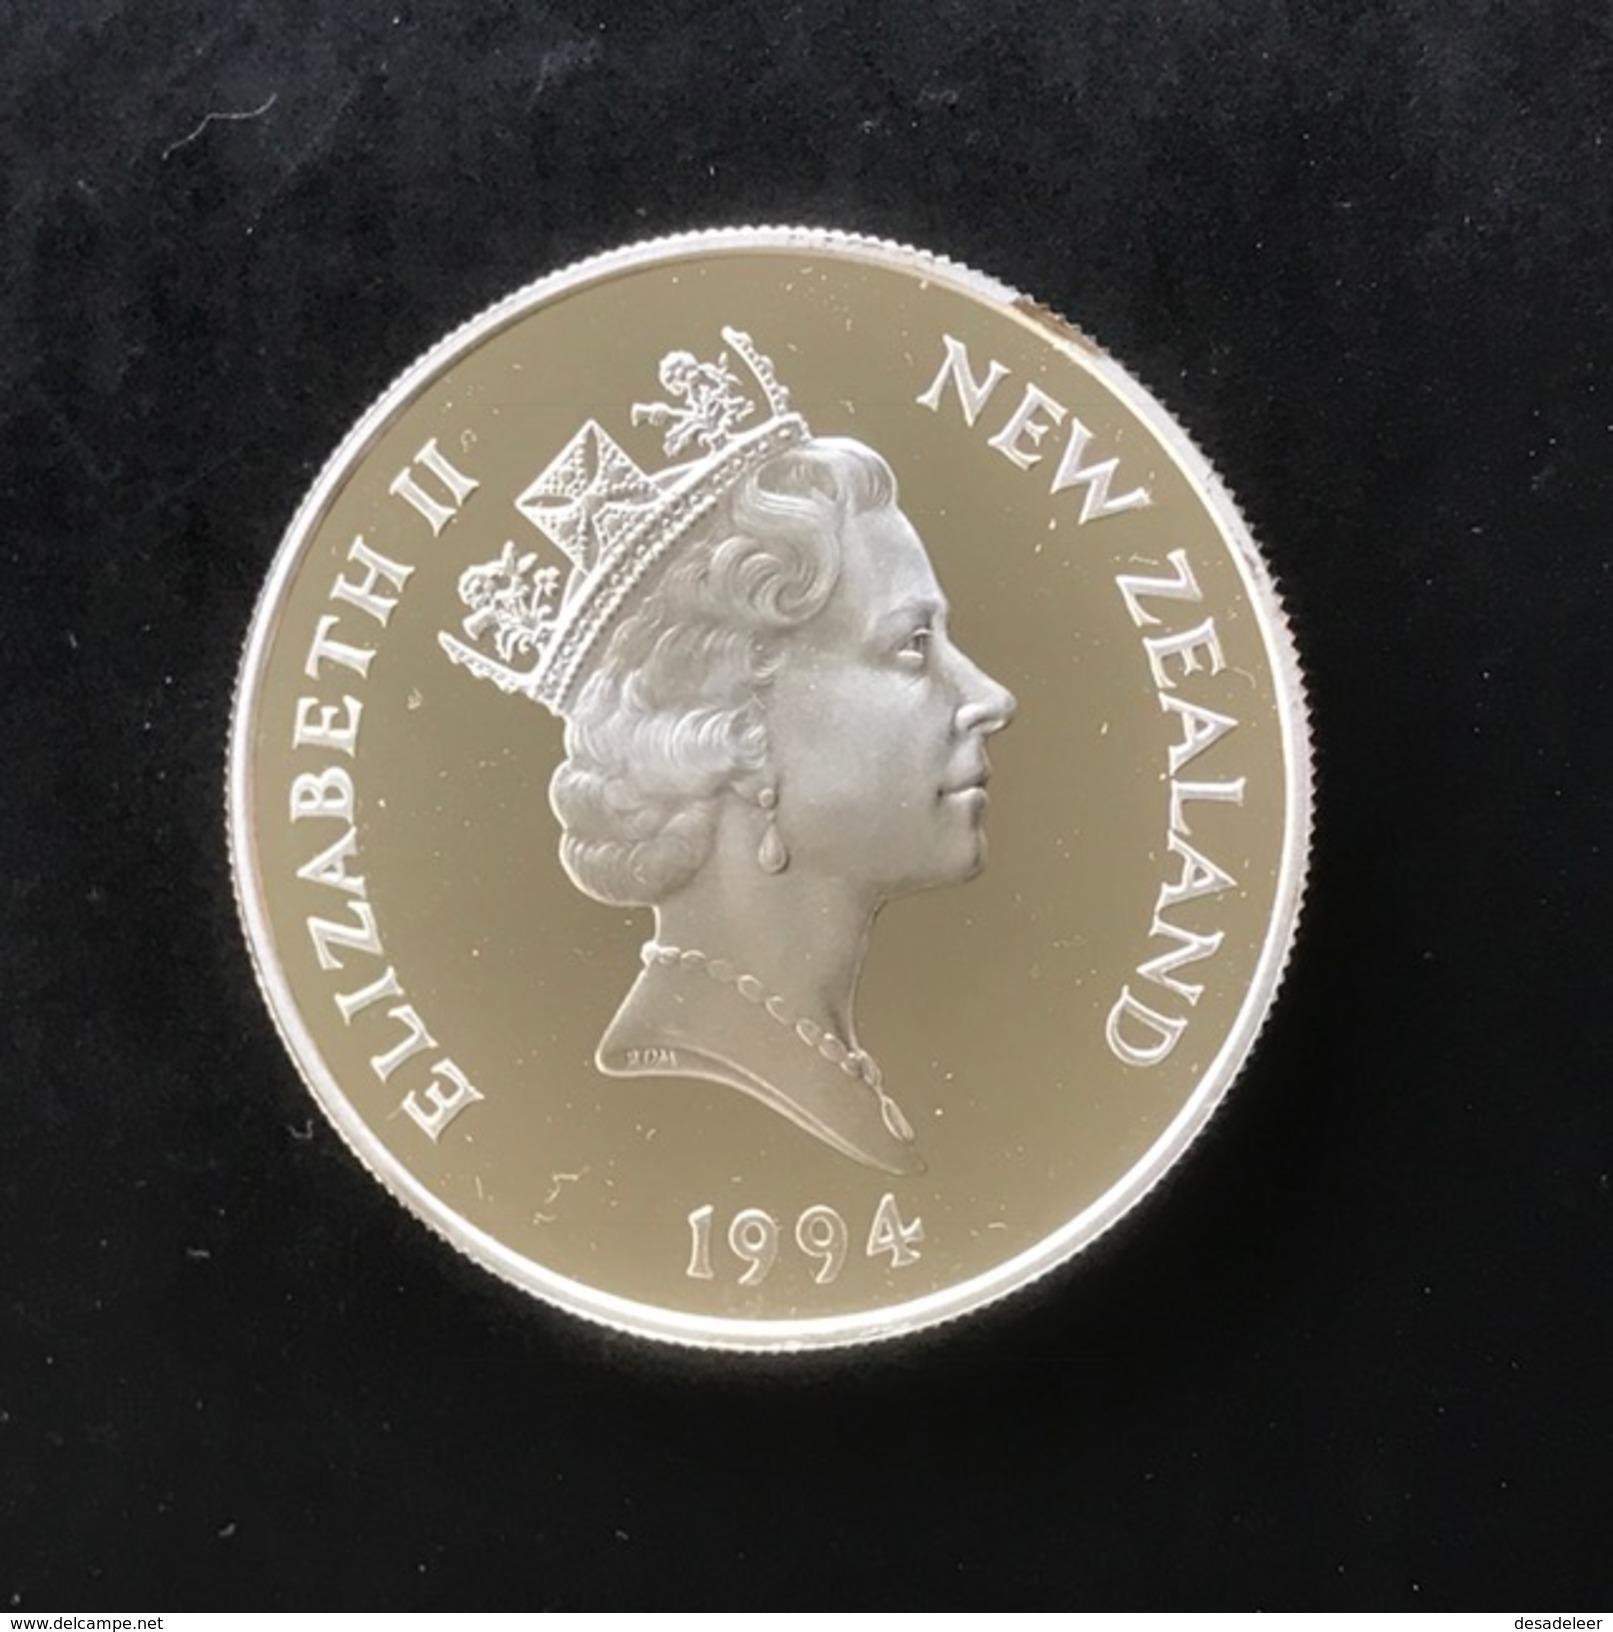 New Zealand 5 Dollar 1994 (Proof) - Winter Olympics - New Zealand